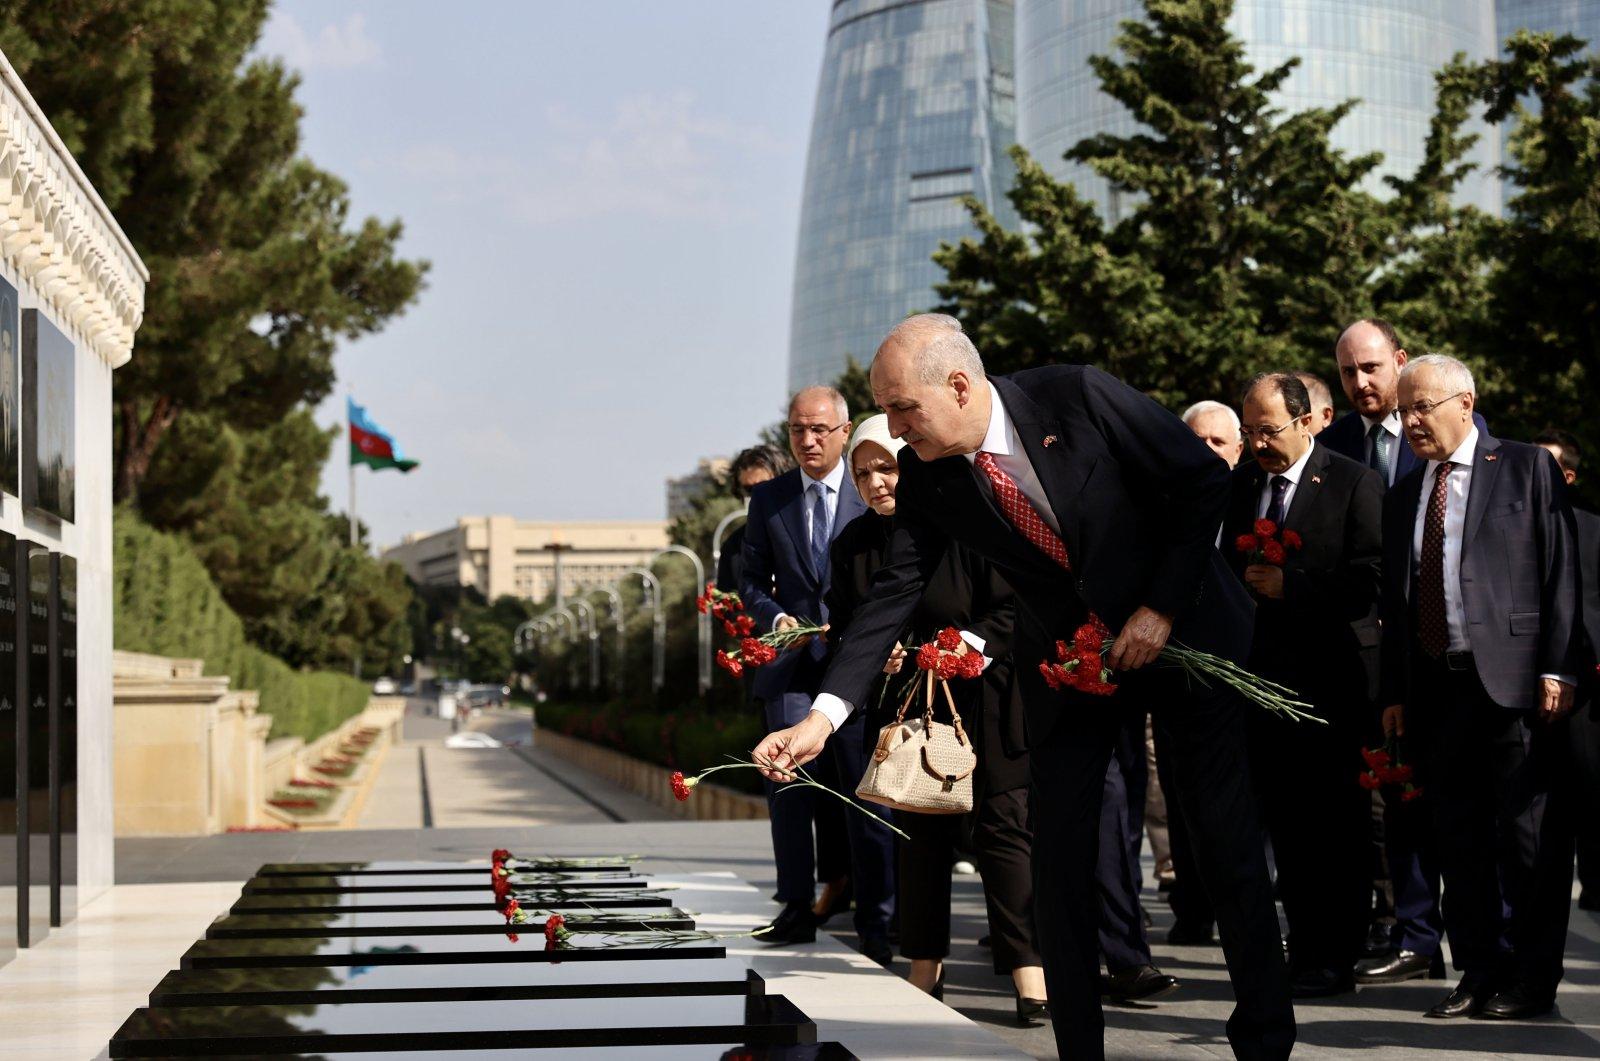 Turkey's ruling Justice and Development Party (AK Party) Deputy Chair Numan Kurtulmuş and his delegation visit the Baku Martyrs' Lane in the capital Baku, Azerbaijan, July 26, 2021. (AA Photo)